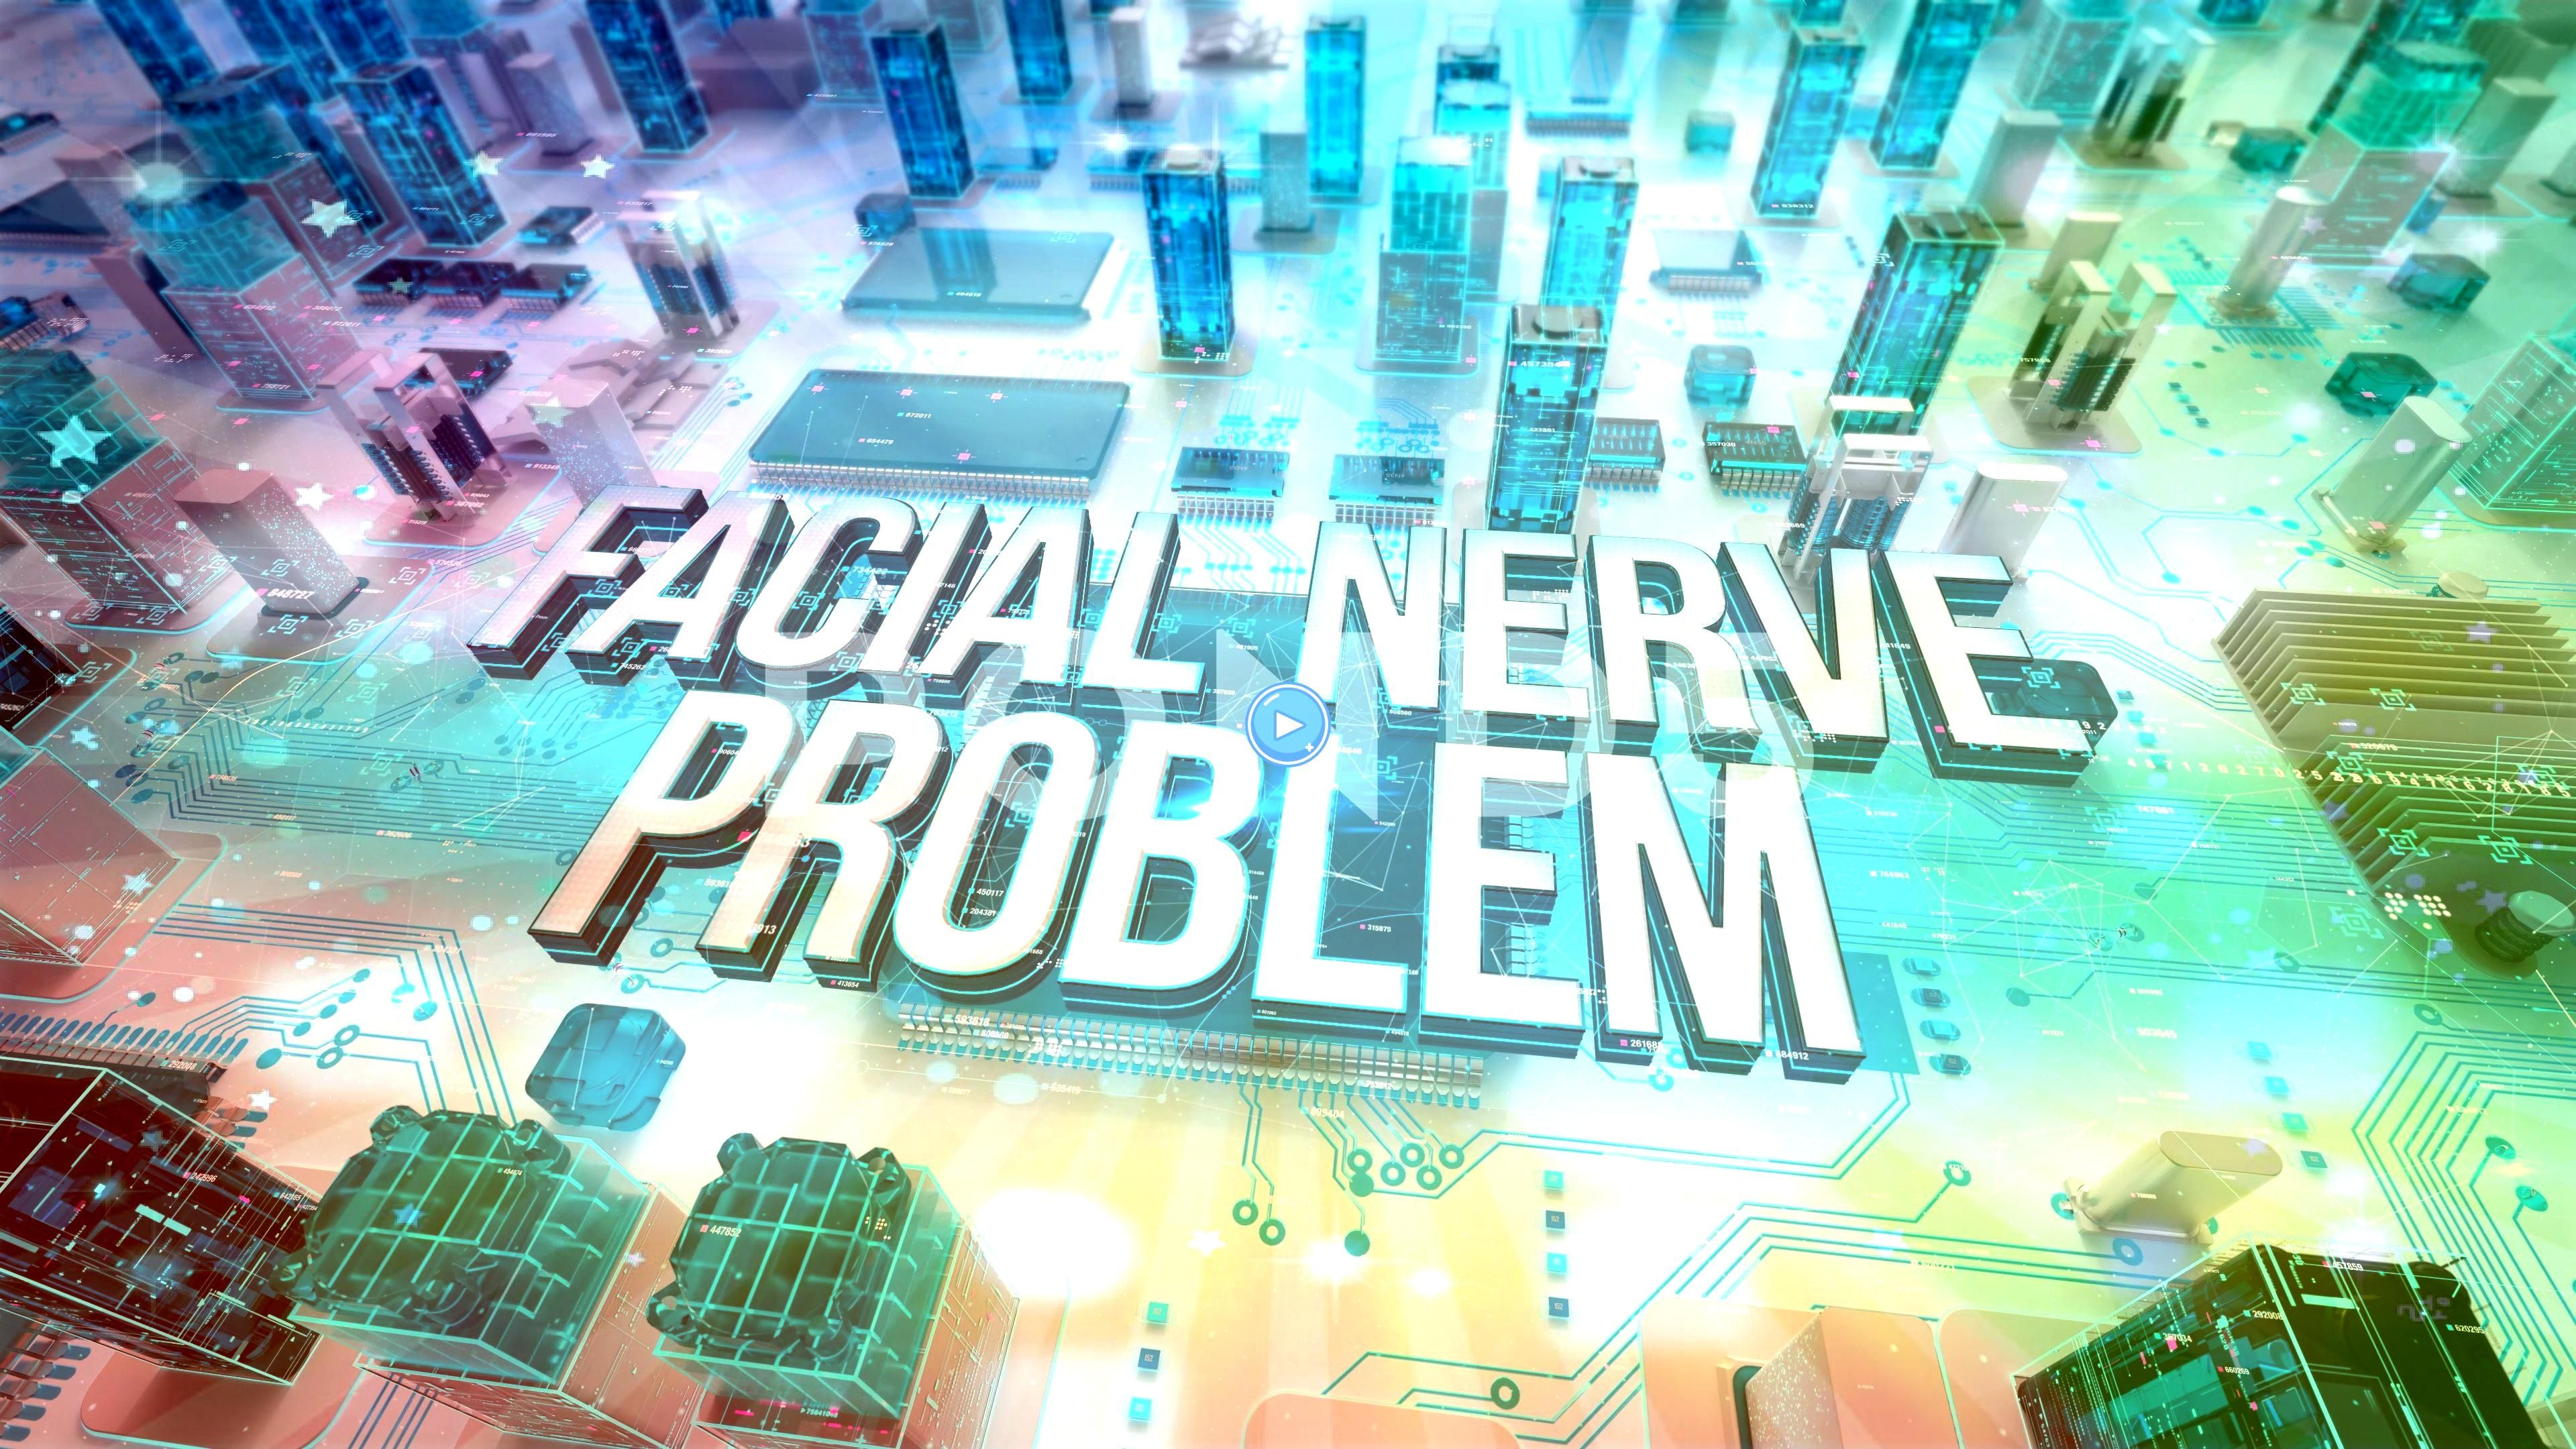 Nerve Problem with medical digital technology concept Stock Footage ProblemmedicalFacialNerveFacial Nerve Problem with medical digital technology concept Stock Footage Pr...